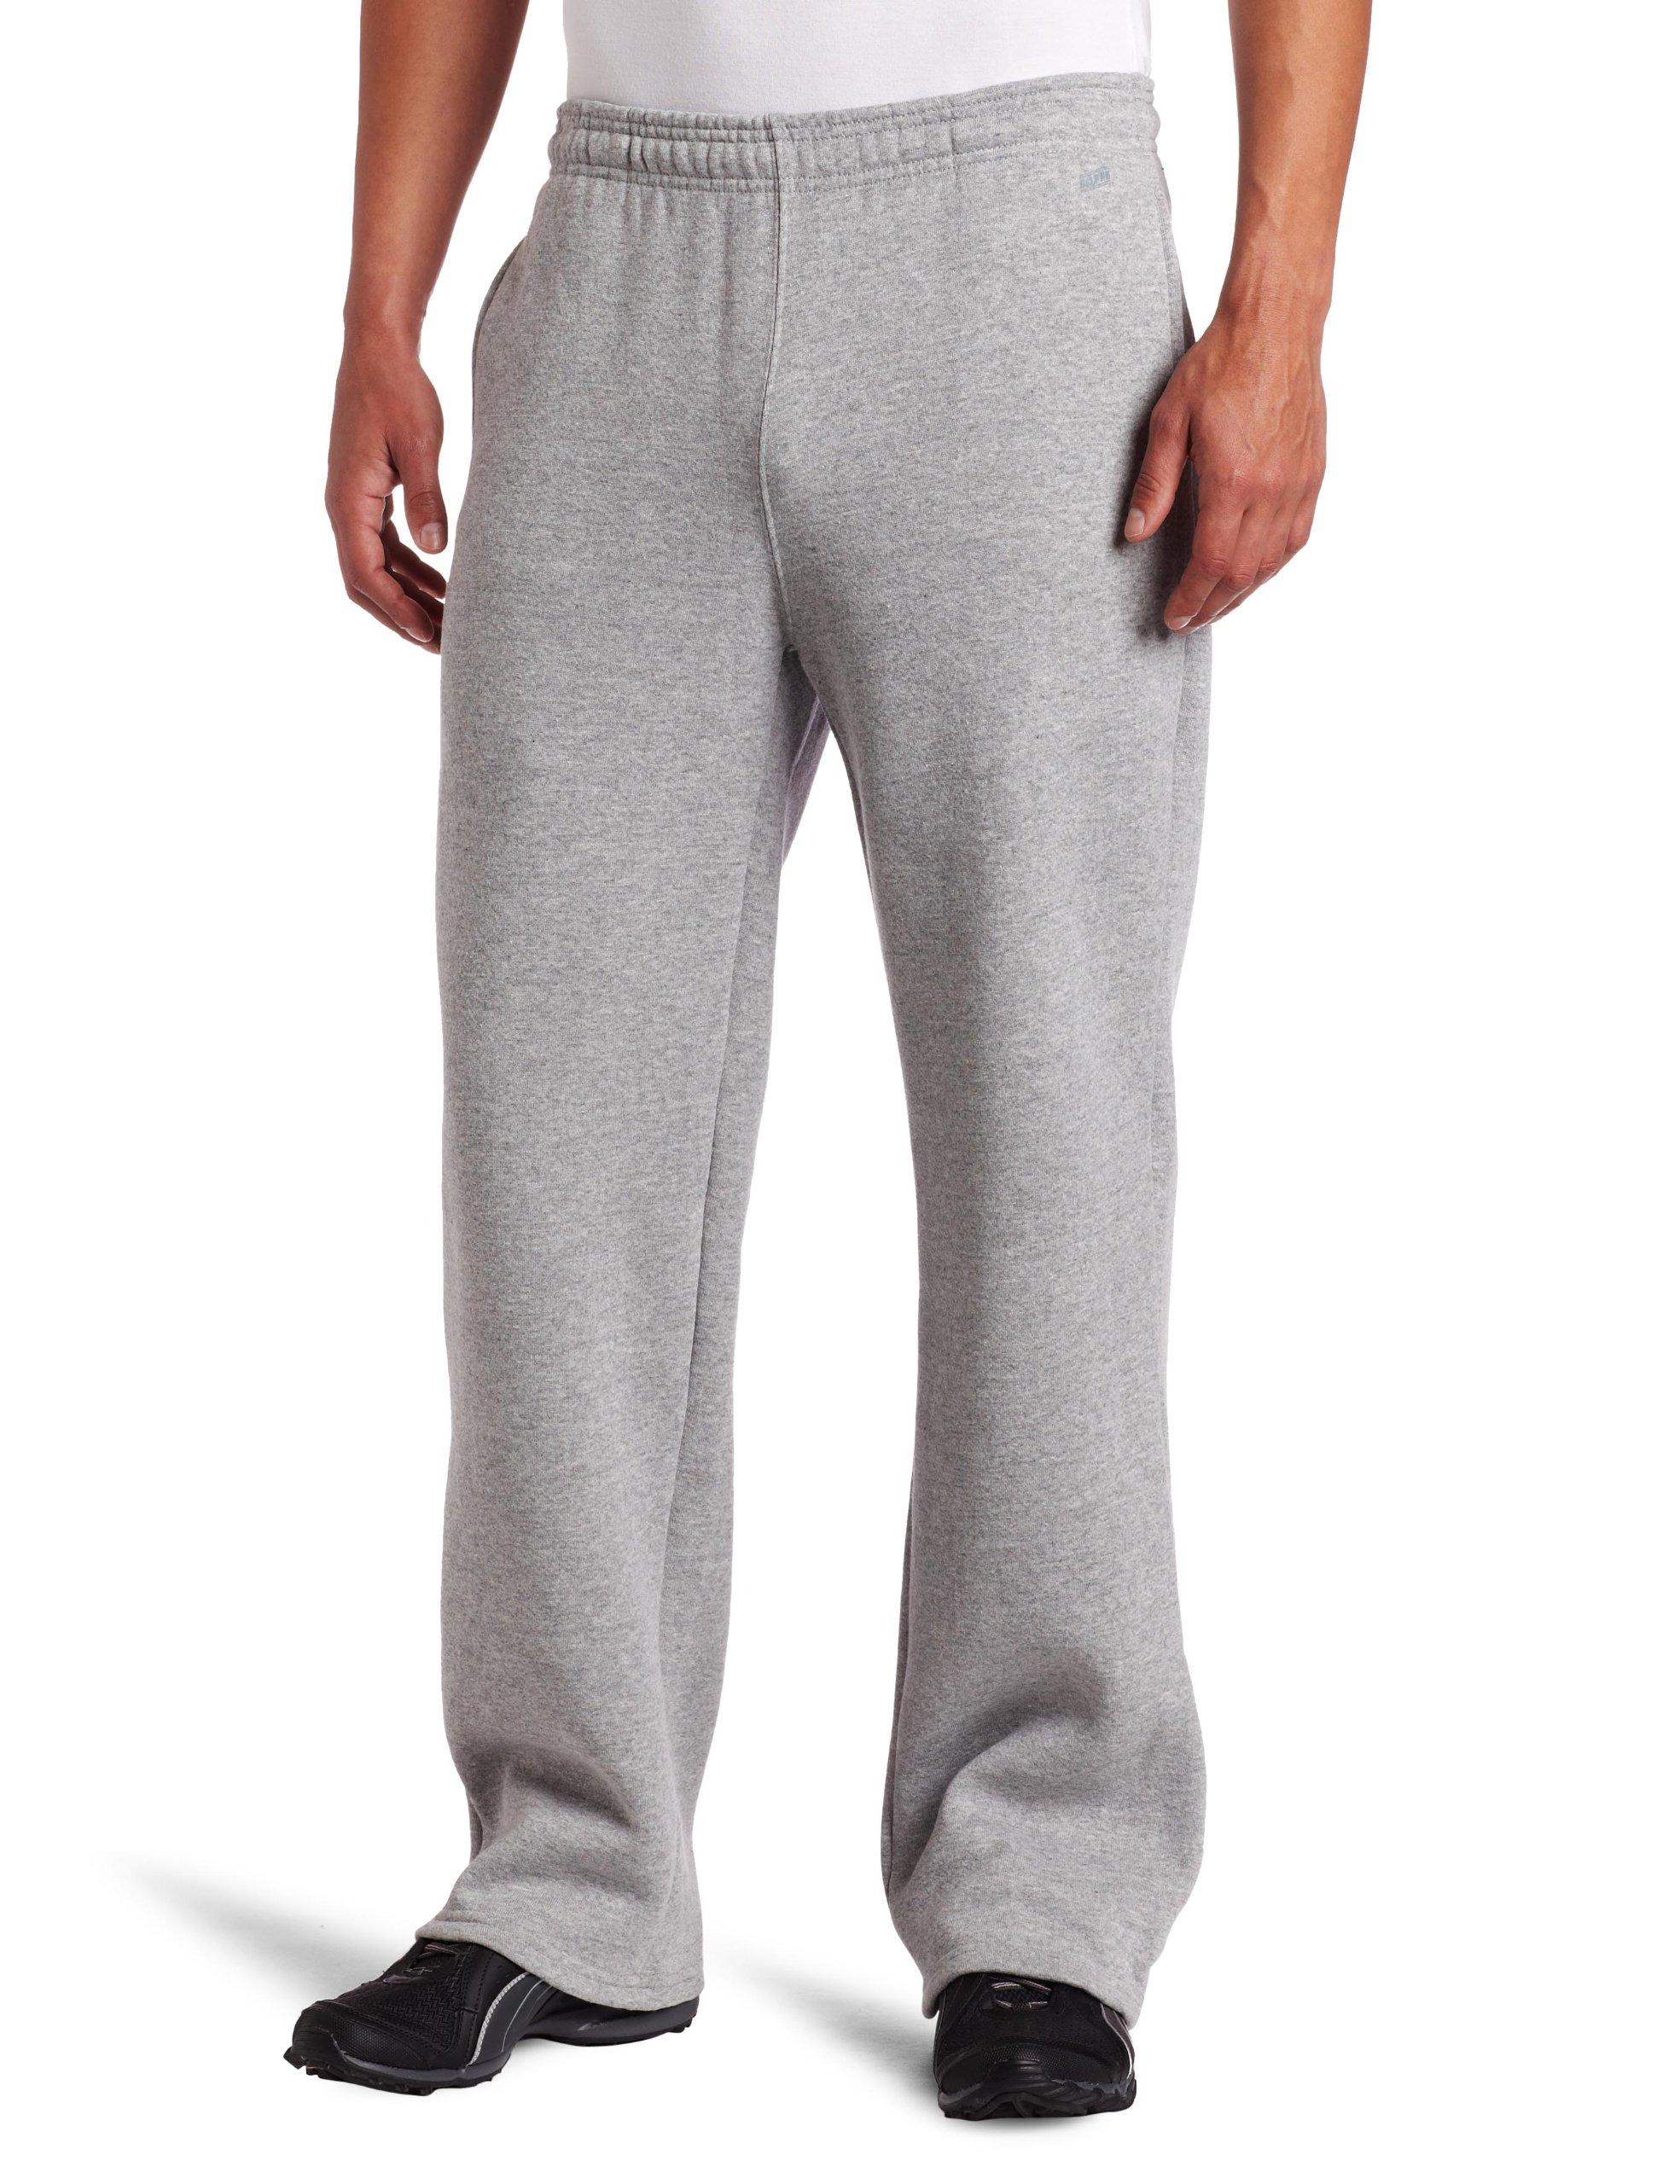 Soffe Men's Training Fleece Pocket Pant Oxford Small